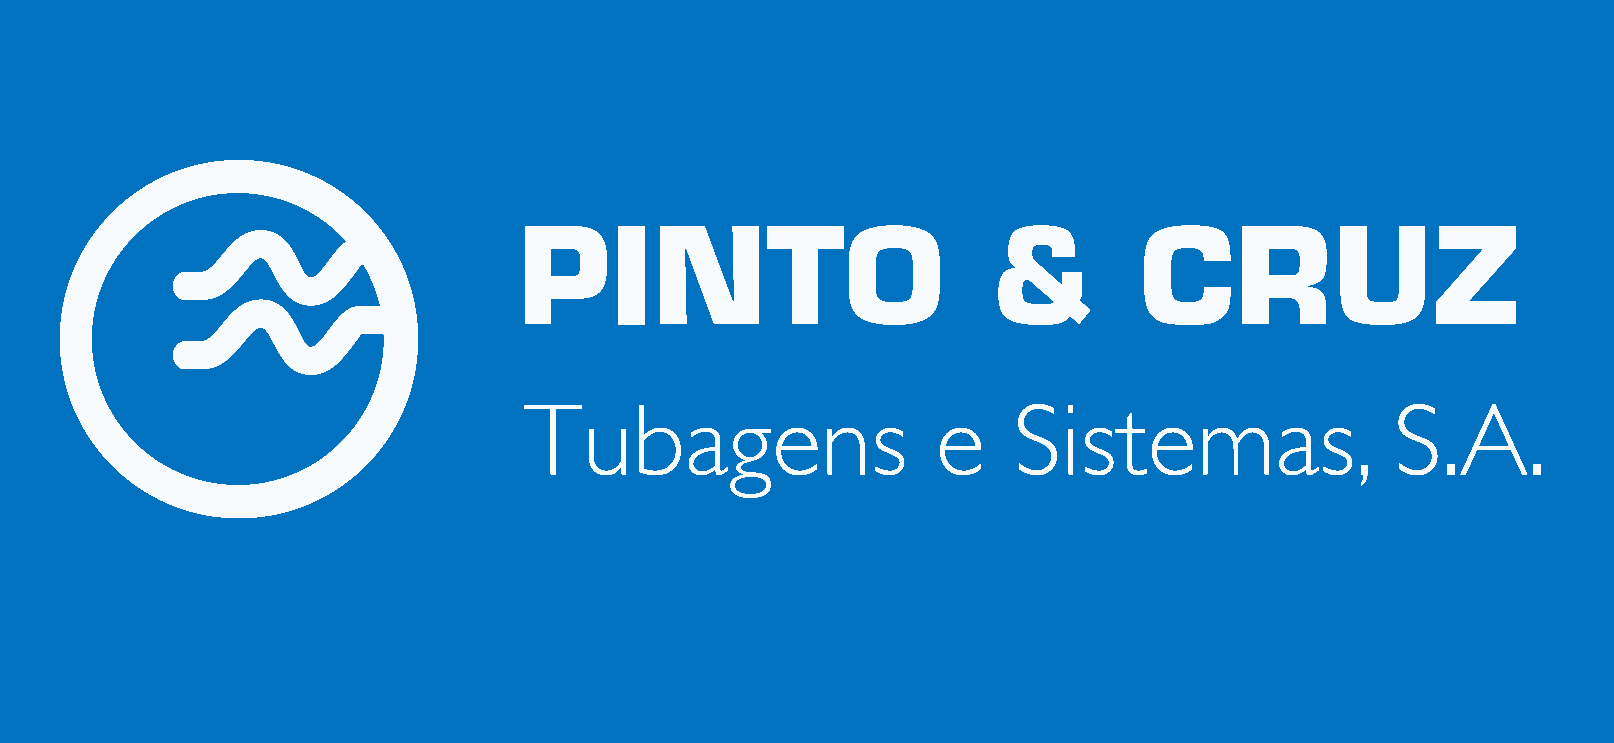 Pinto Cruz Tubagens Sistemas Logo